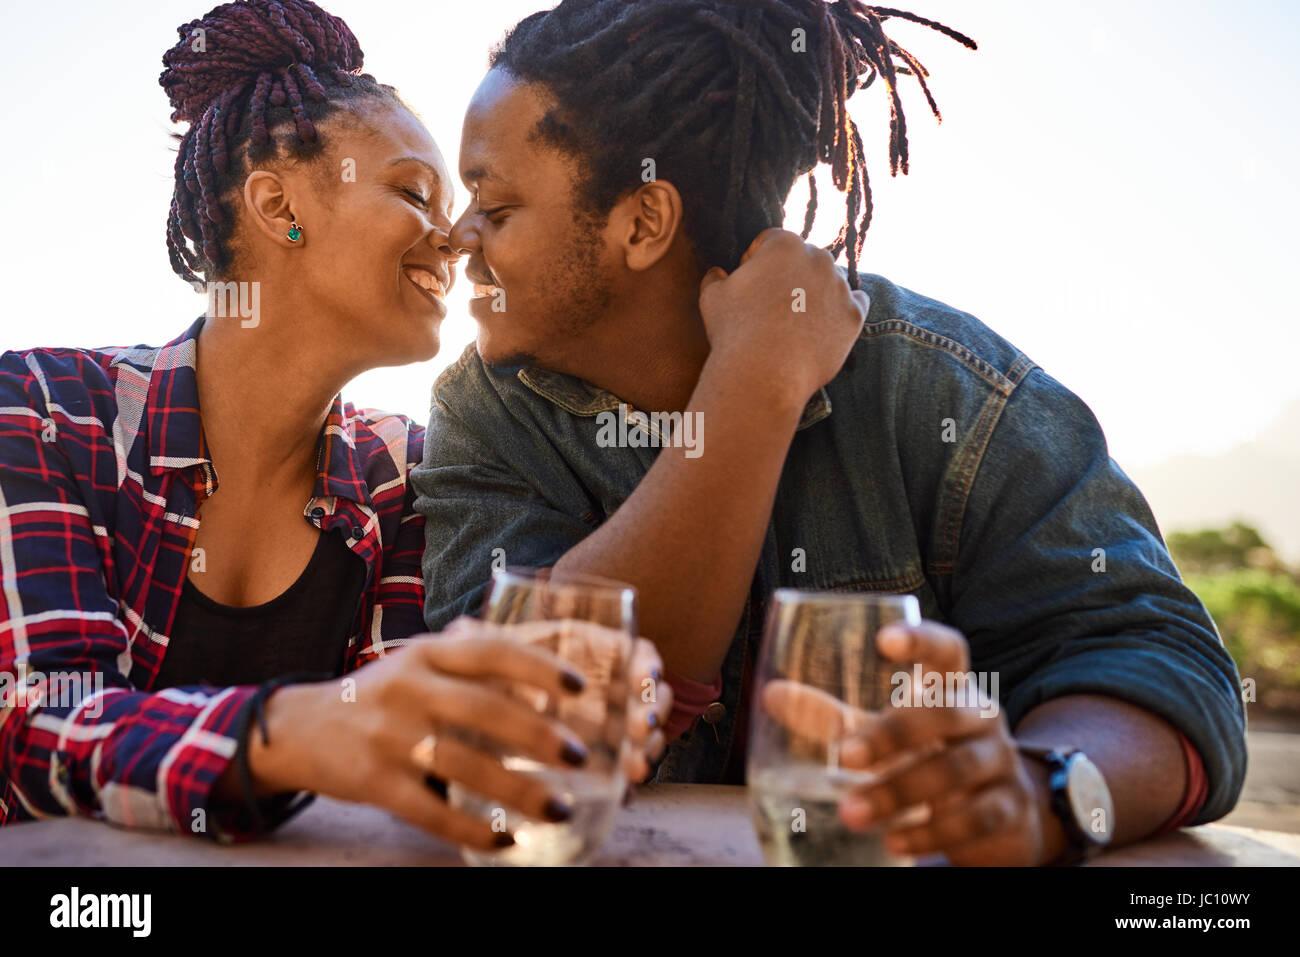 Echtes paar afrikanischer Abstammung während umarmen küssen Stockbild